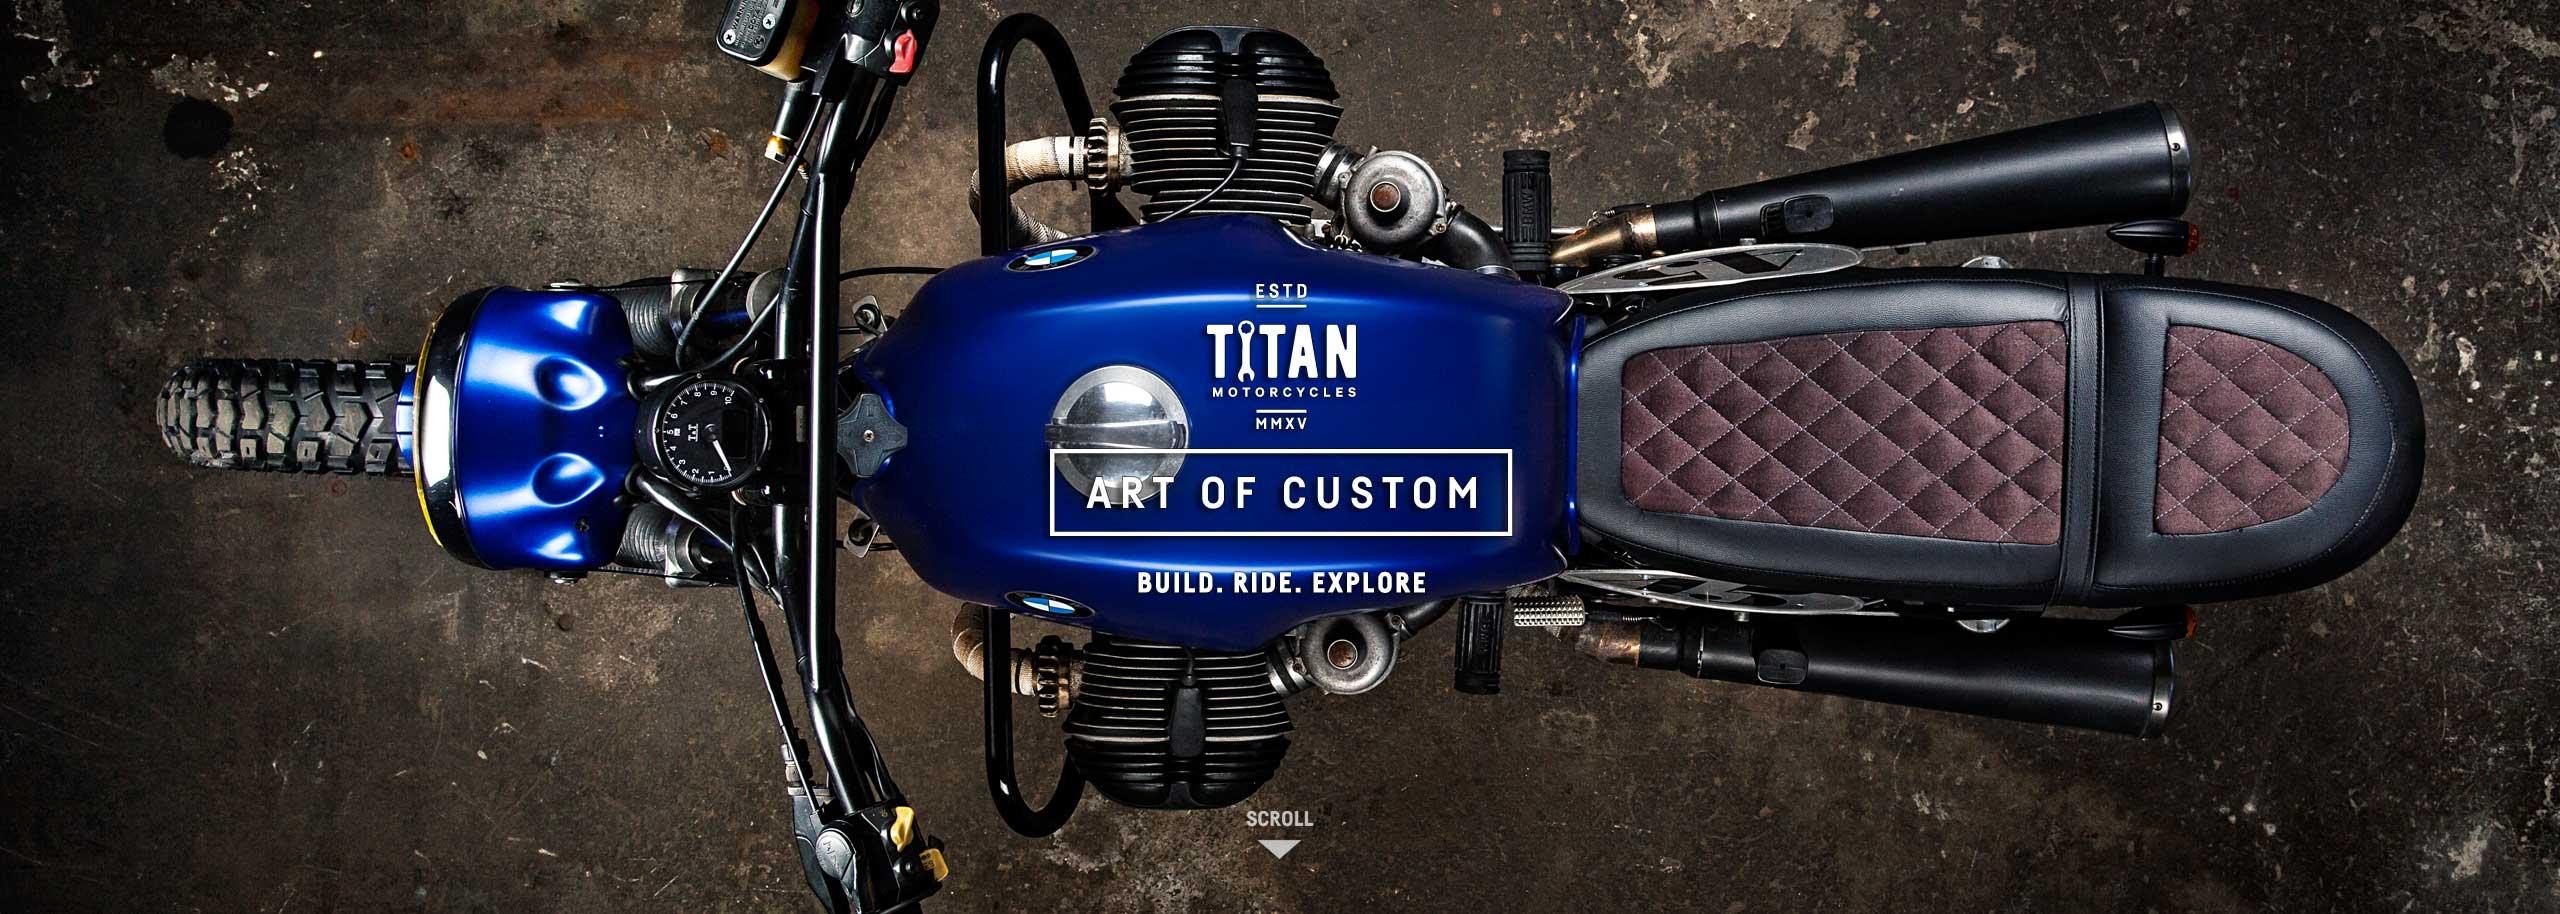 01_TITAN-Milano_BMW-R100-RS_Cafe-Racer-Motorrad-Umbau-Graz-Austria-Heidenau_BMW-Motorrad-Umbauten_individuell-TYPISIERT